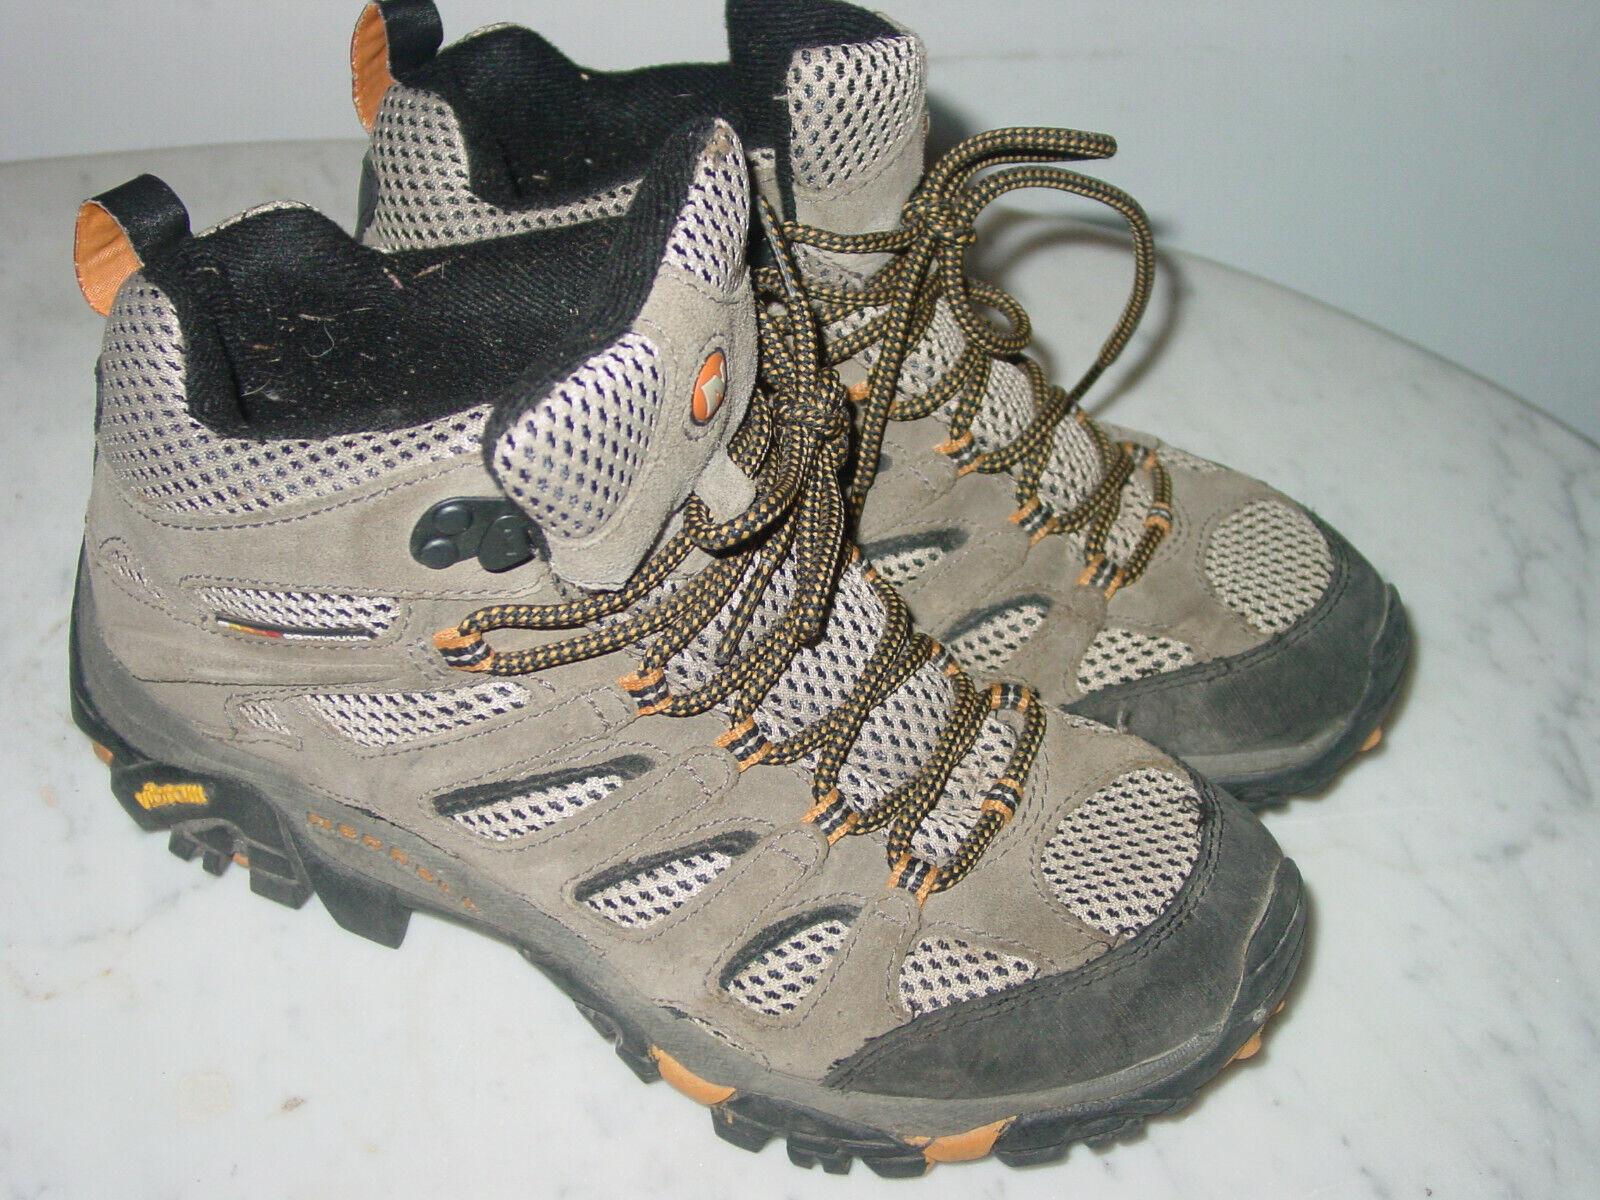 Merrell Moab Ventilator Nogal J86593 Mid Trail Hiking tamaño del zapato 7.5